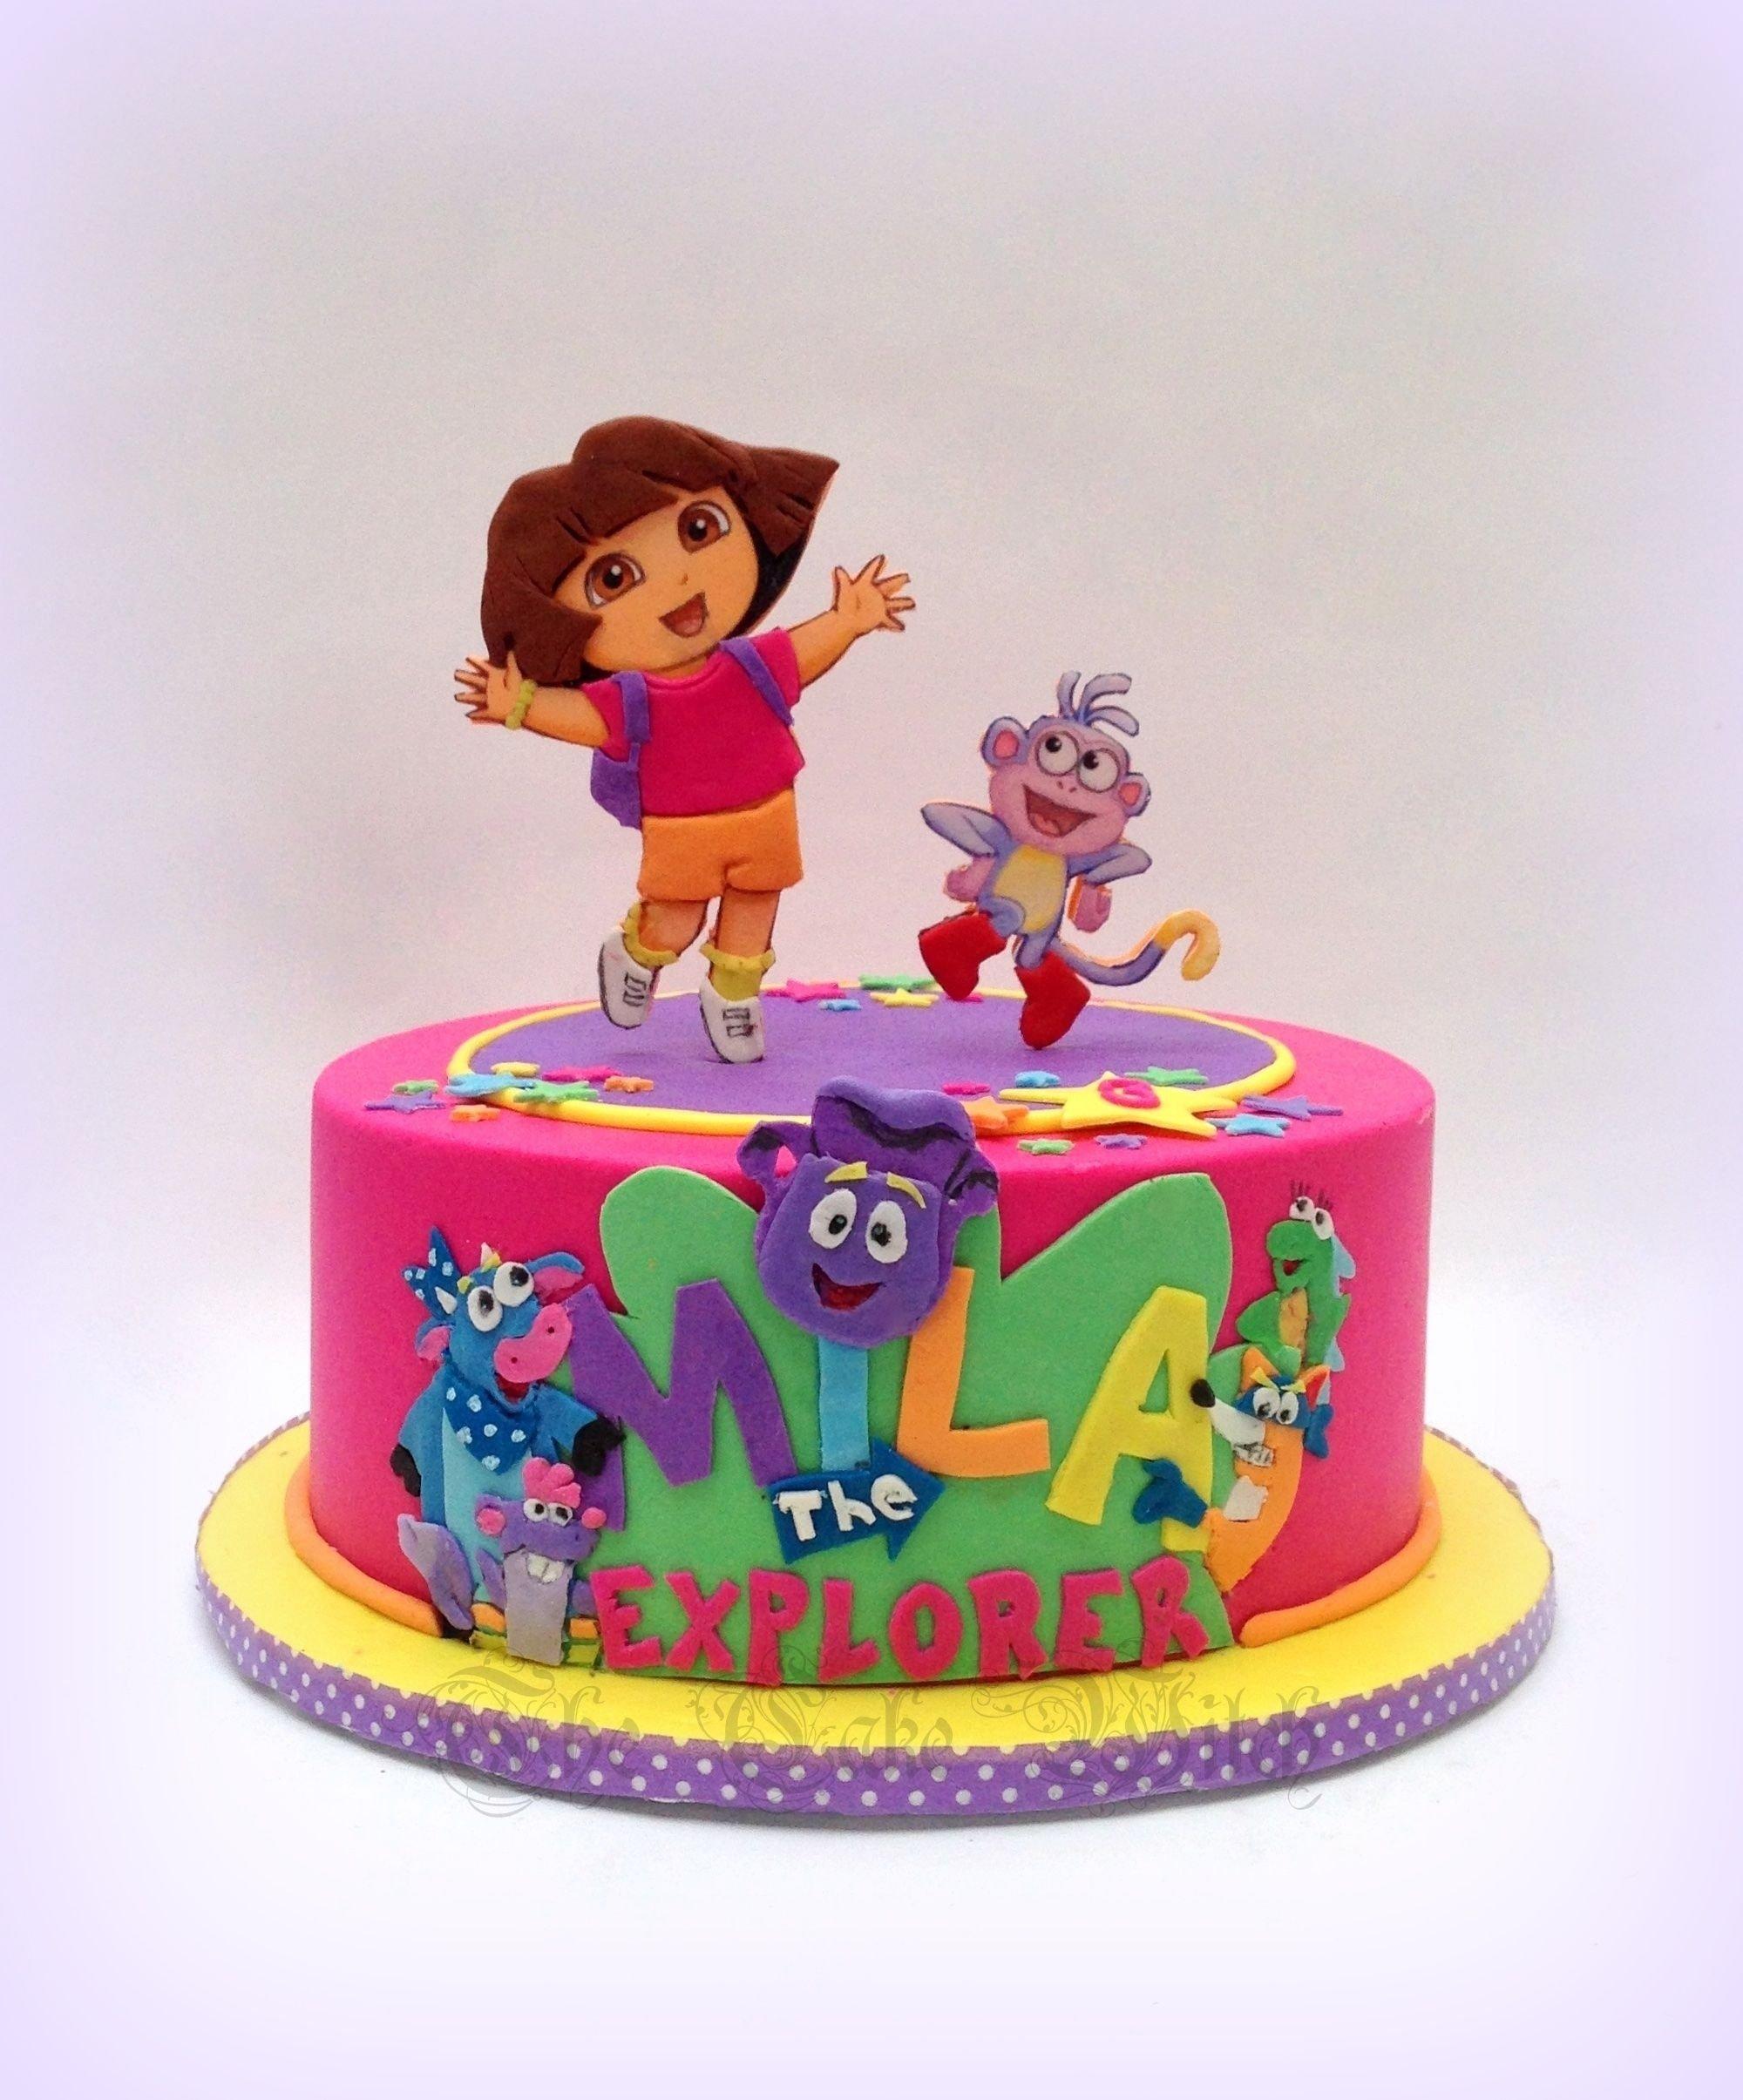 10 Awesome Dora The Explorer Cake Ideas dora the explorer birthday cake pinteres 2021